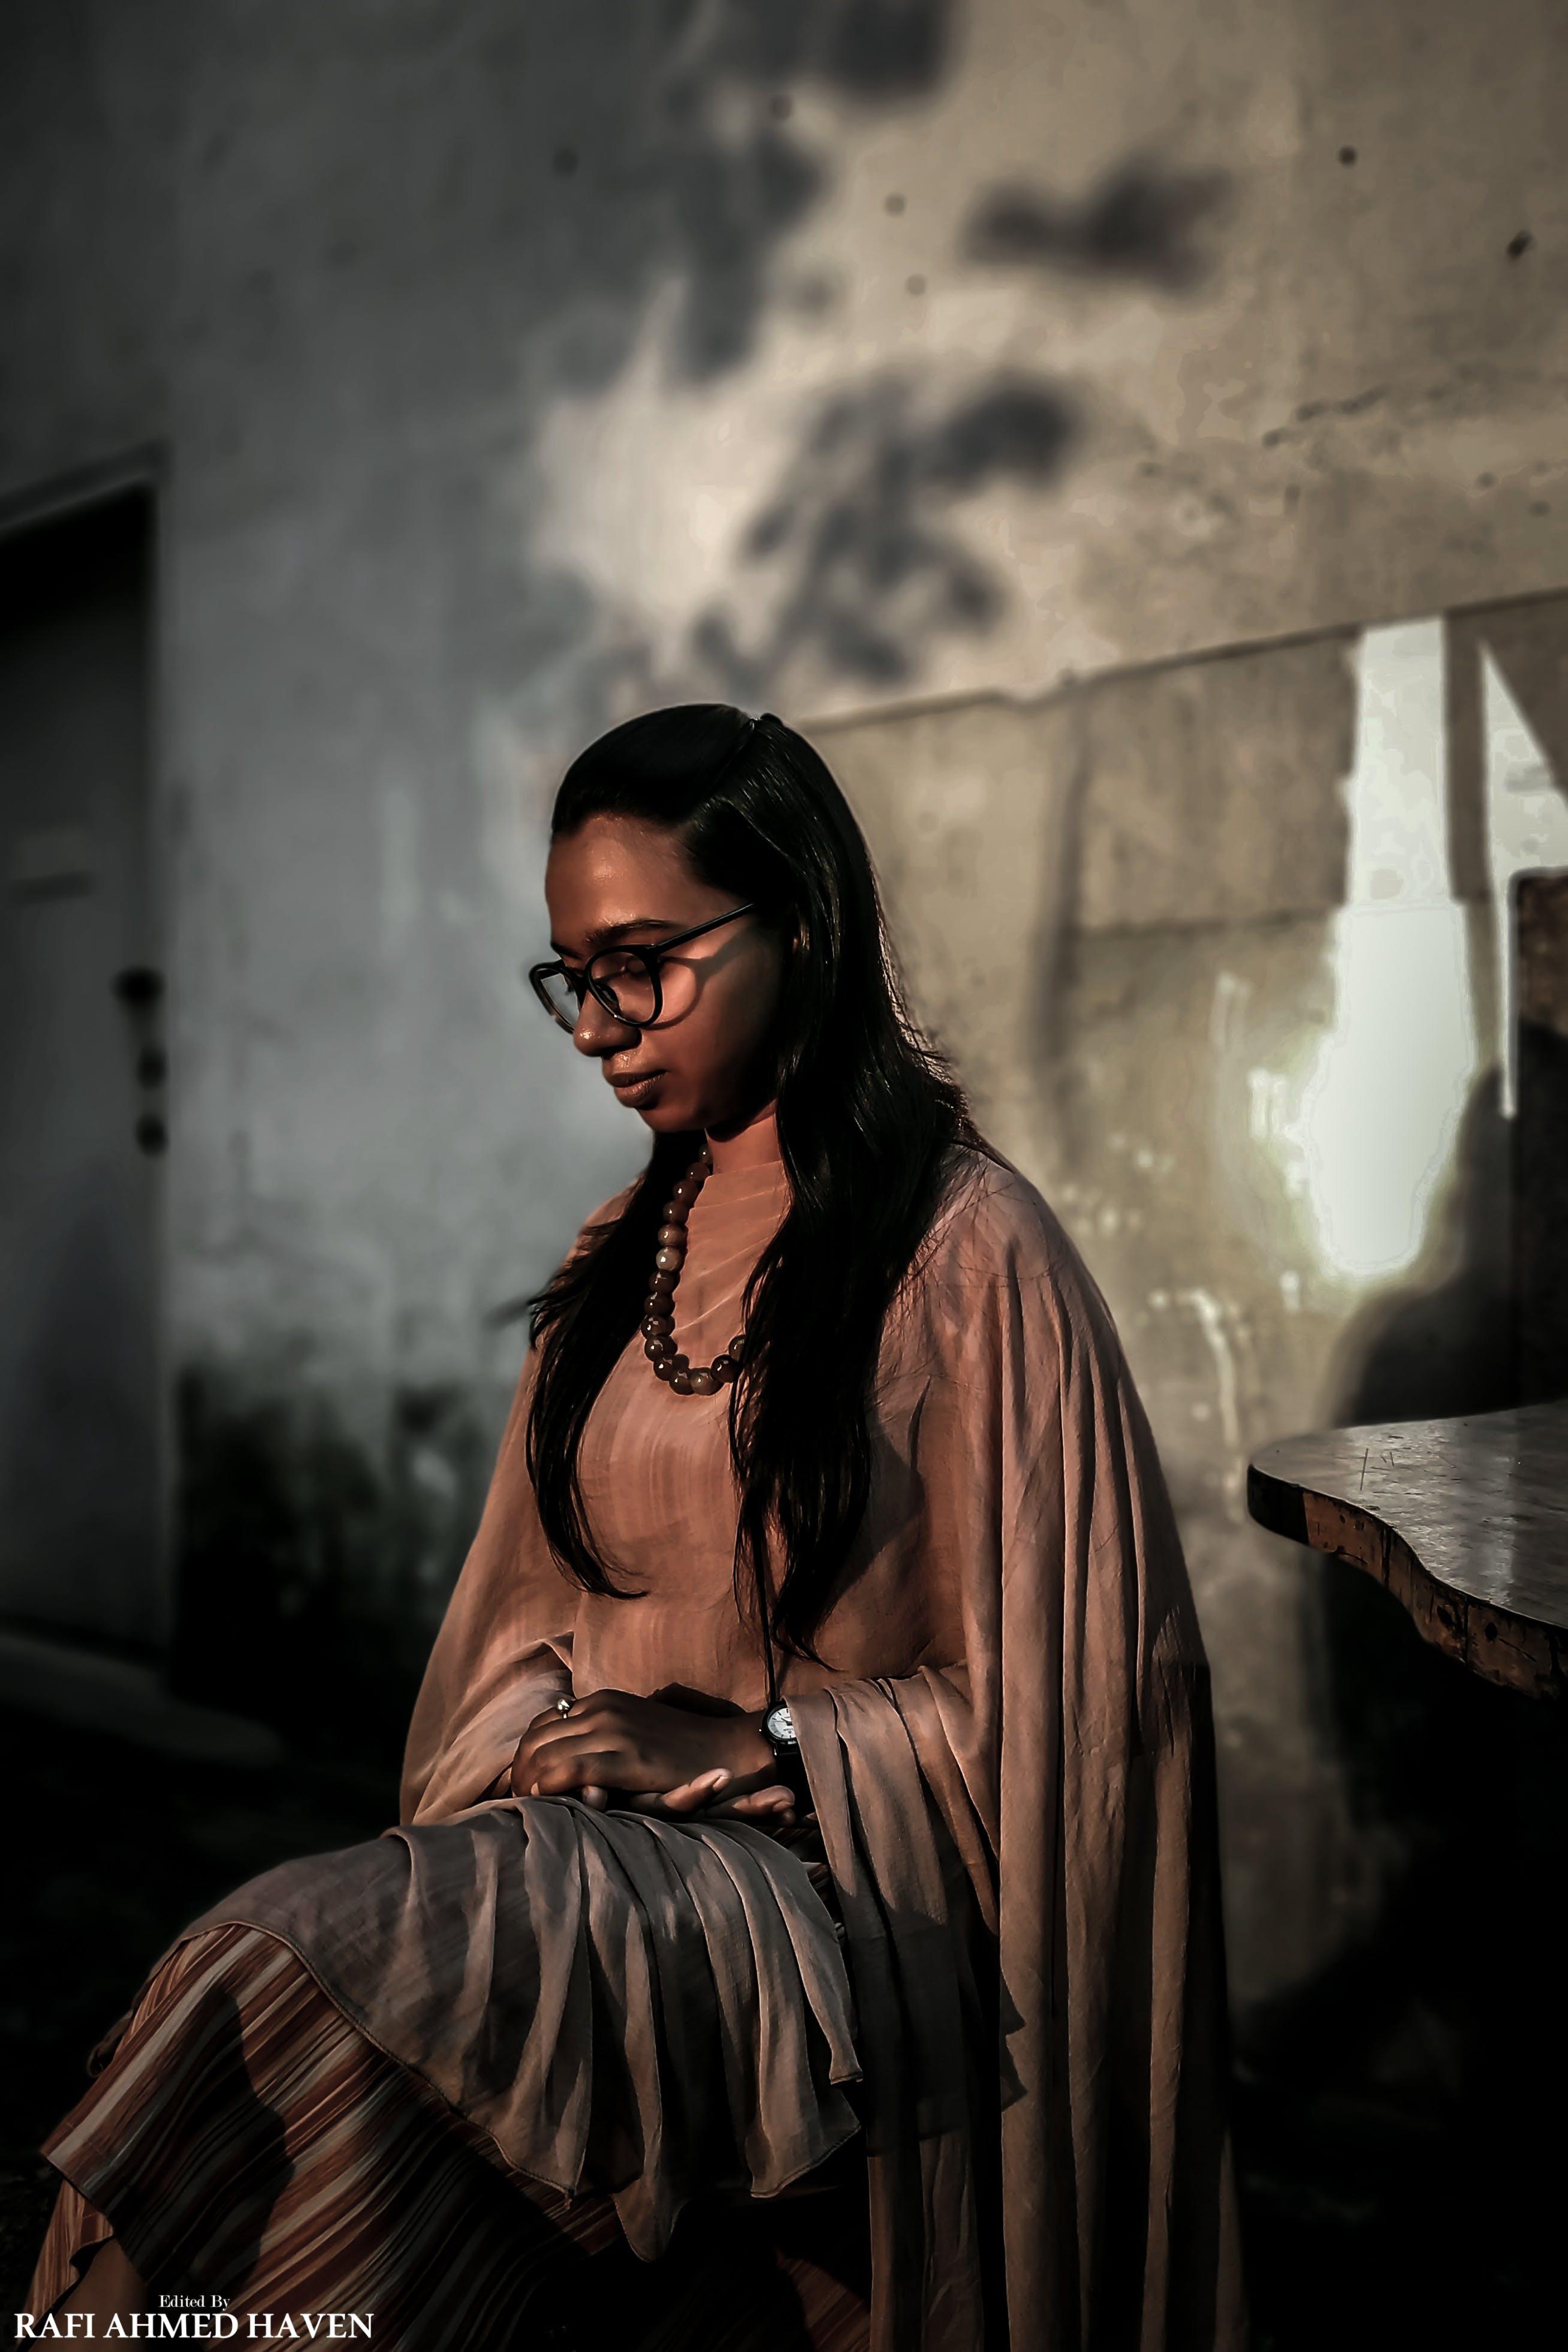 Free stock photo of #HASTAG, Adobe Photoshop, beautiful women, black women